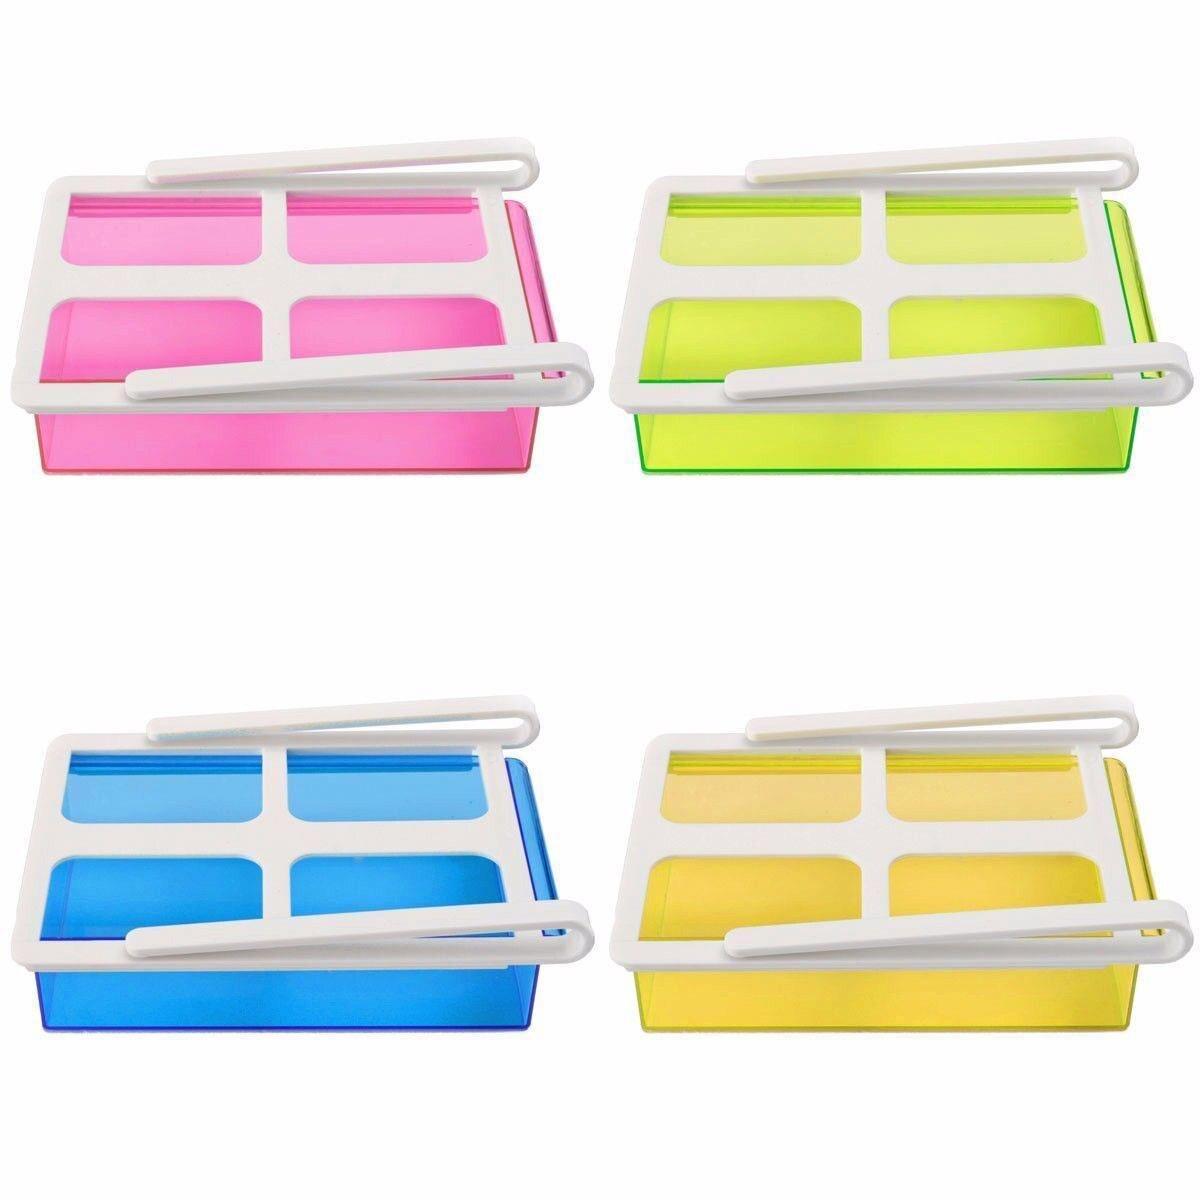 Organizador de almacenamiento para almacenaje para nevera de cocina estante deslizante congelador estante azul nevera